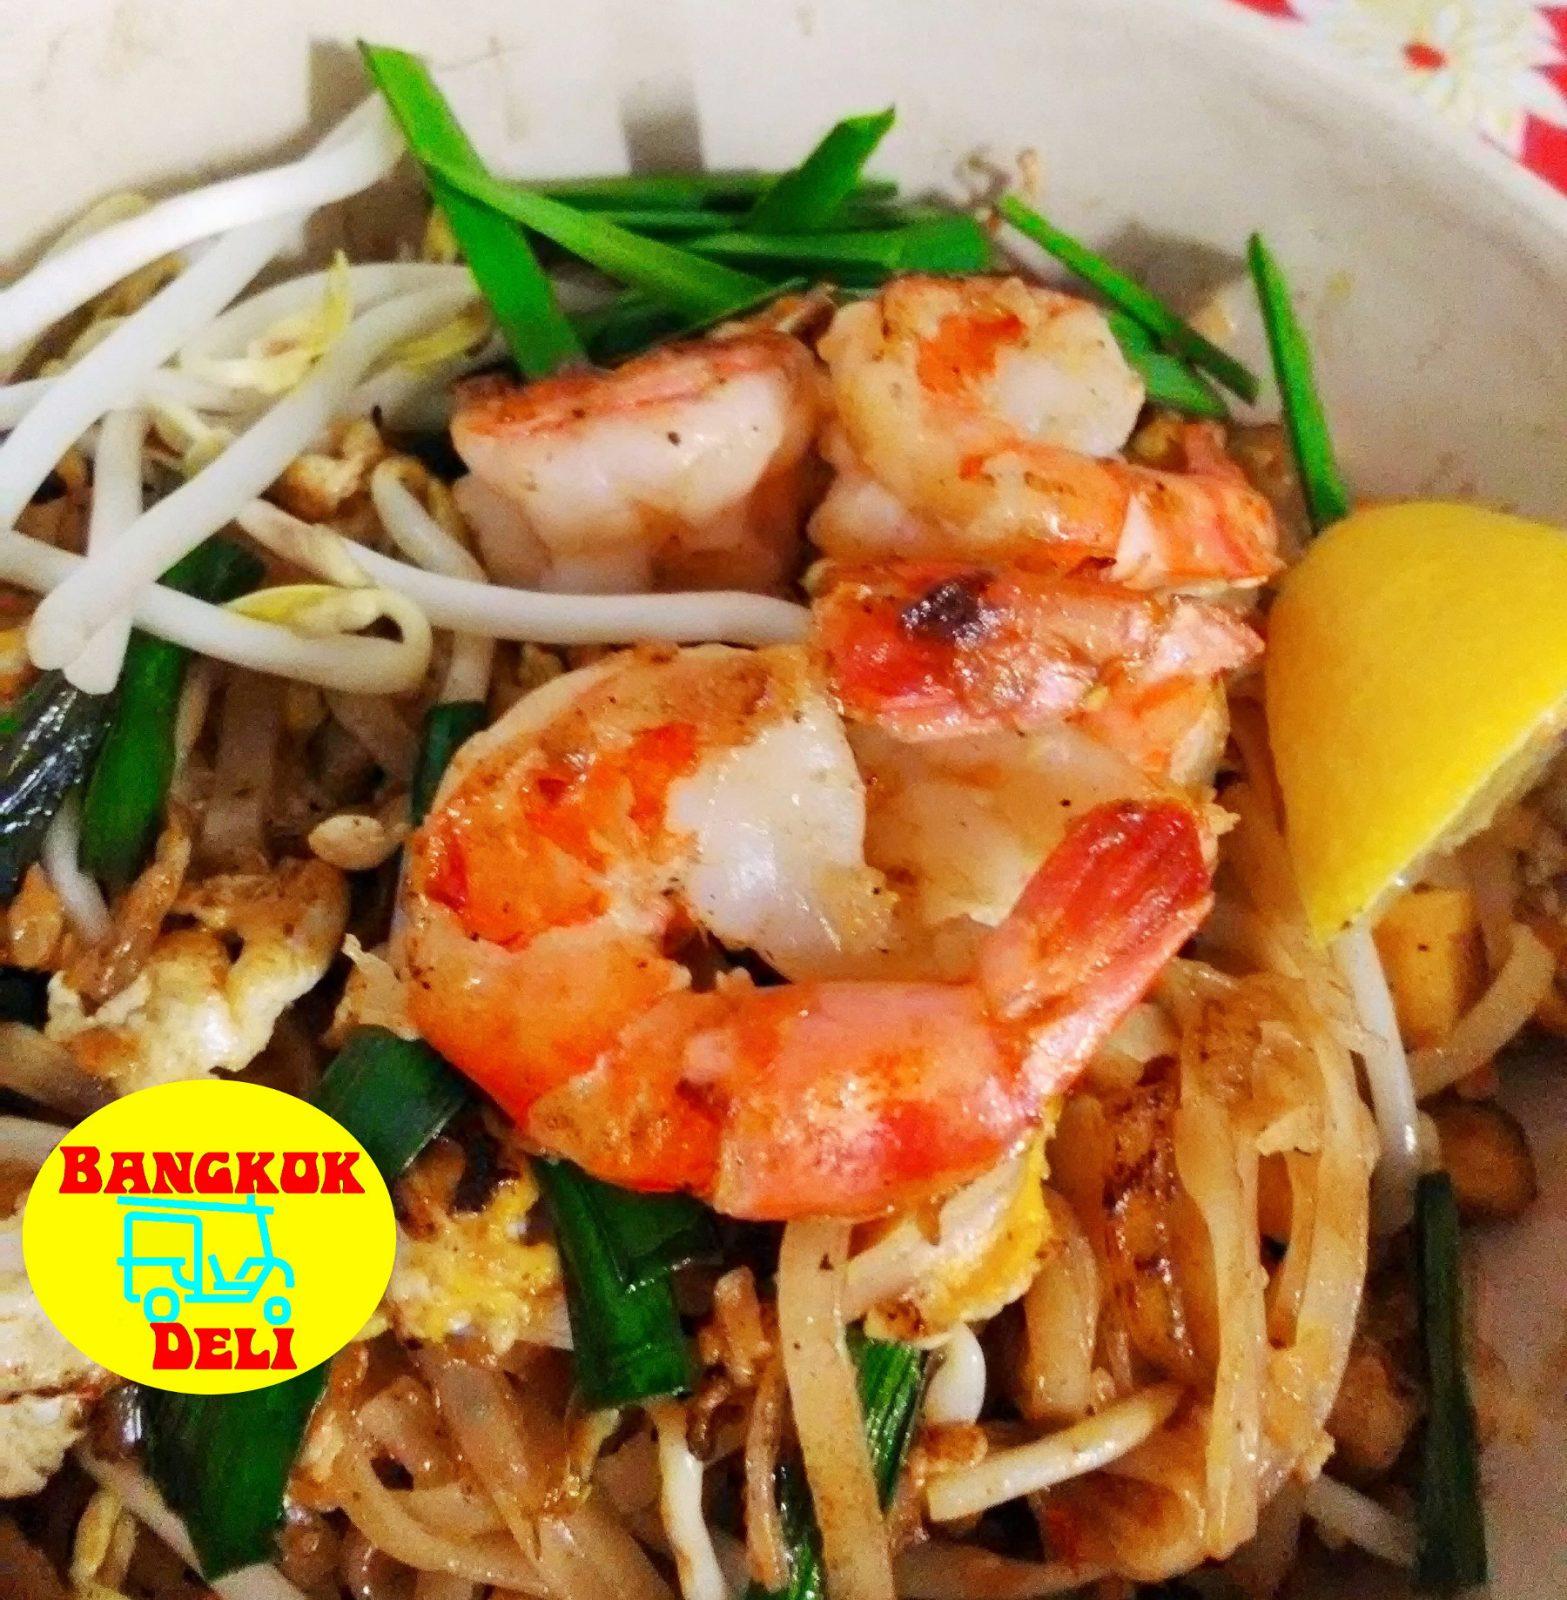 Plats au Bangkok Deli Street Food